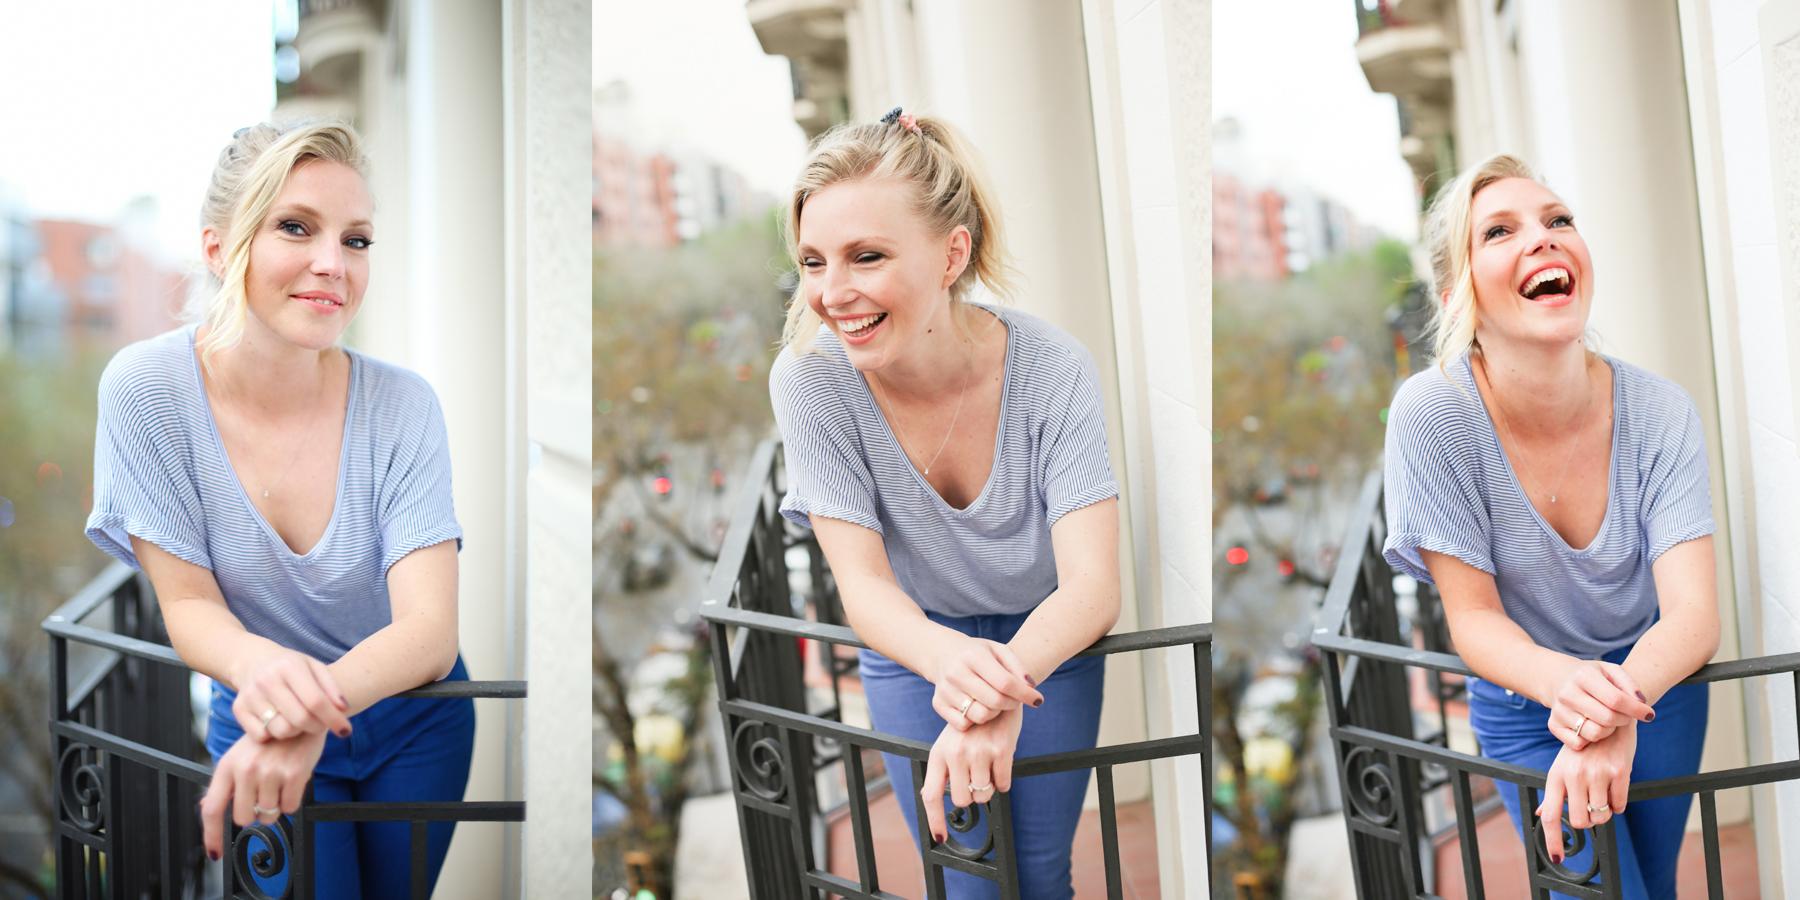 Barcelona personal fashion photographer